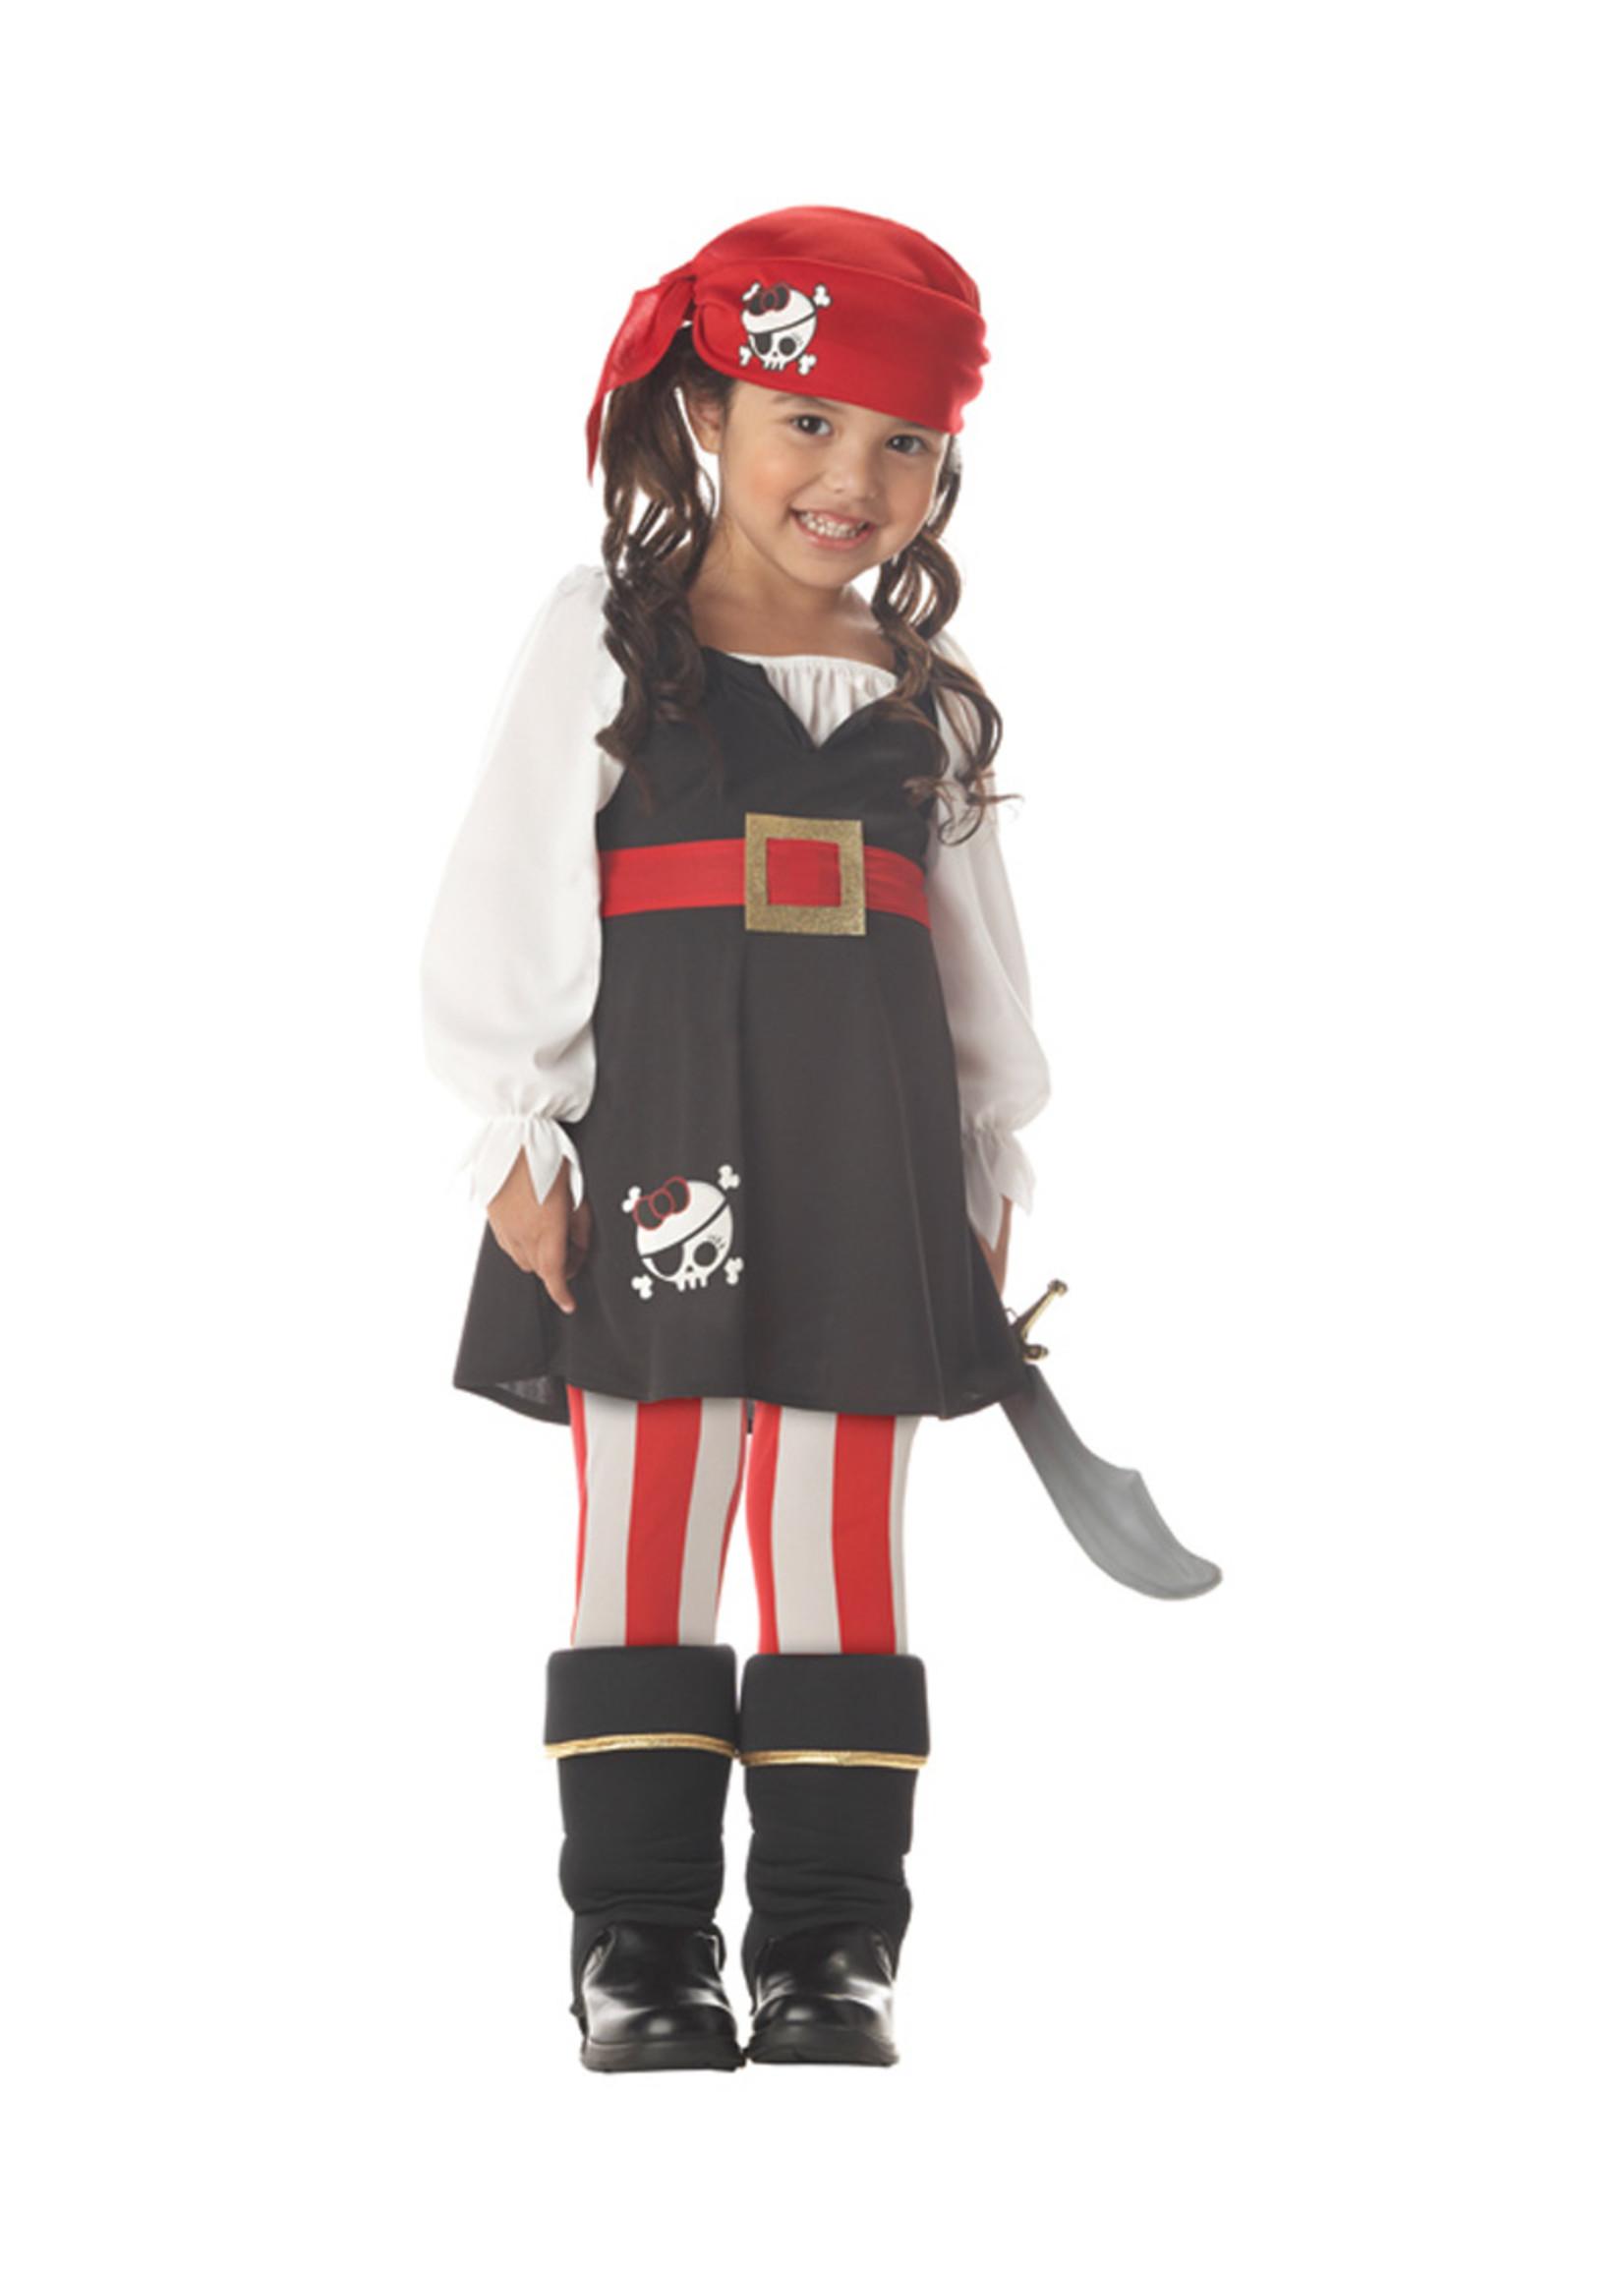 Precious Lil' Pirate Costume - Toddler